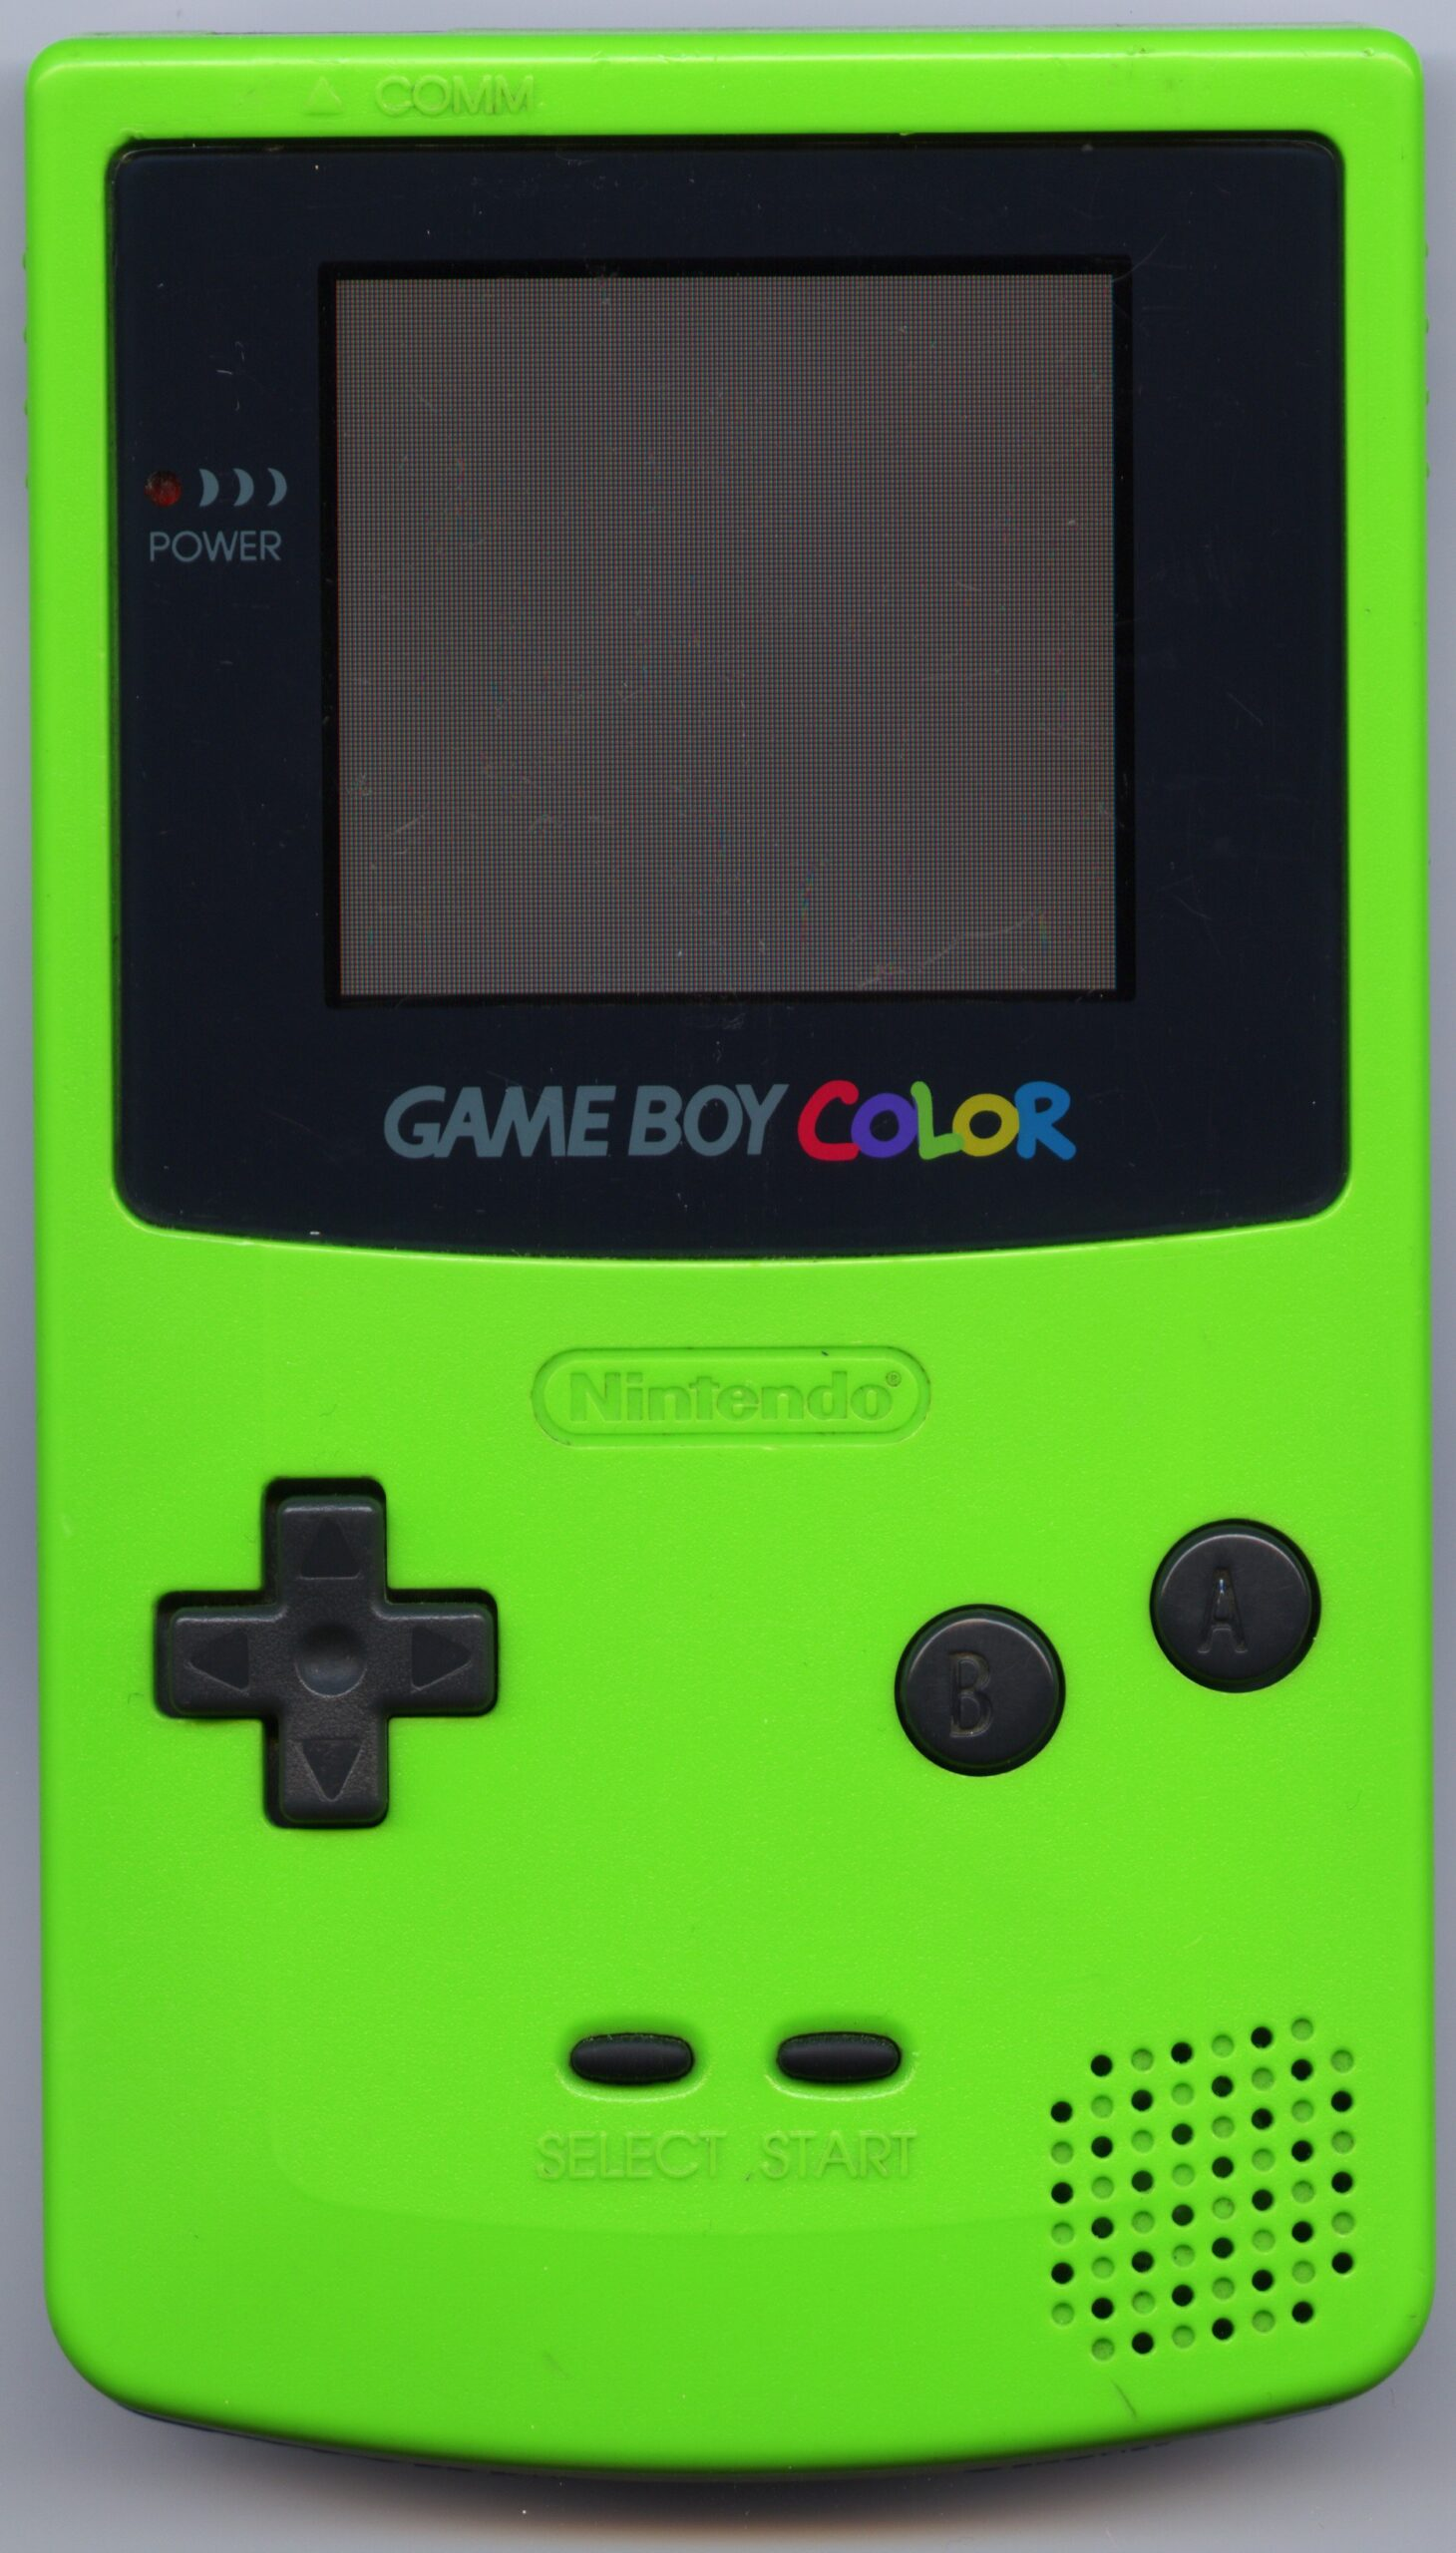 Gameboy Color (Green) CGB-001